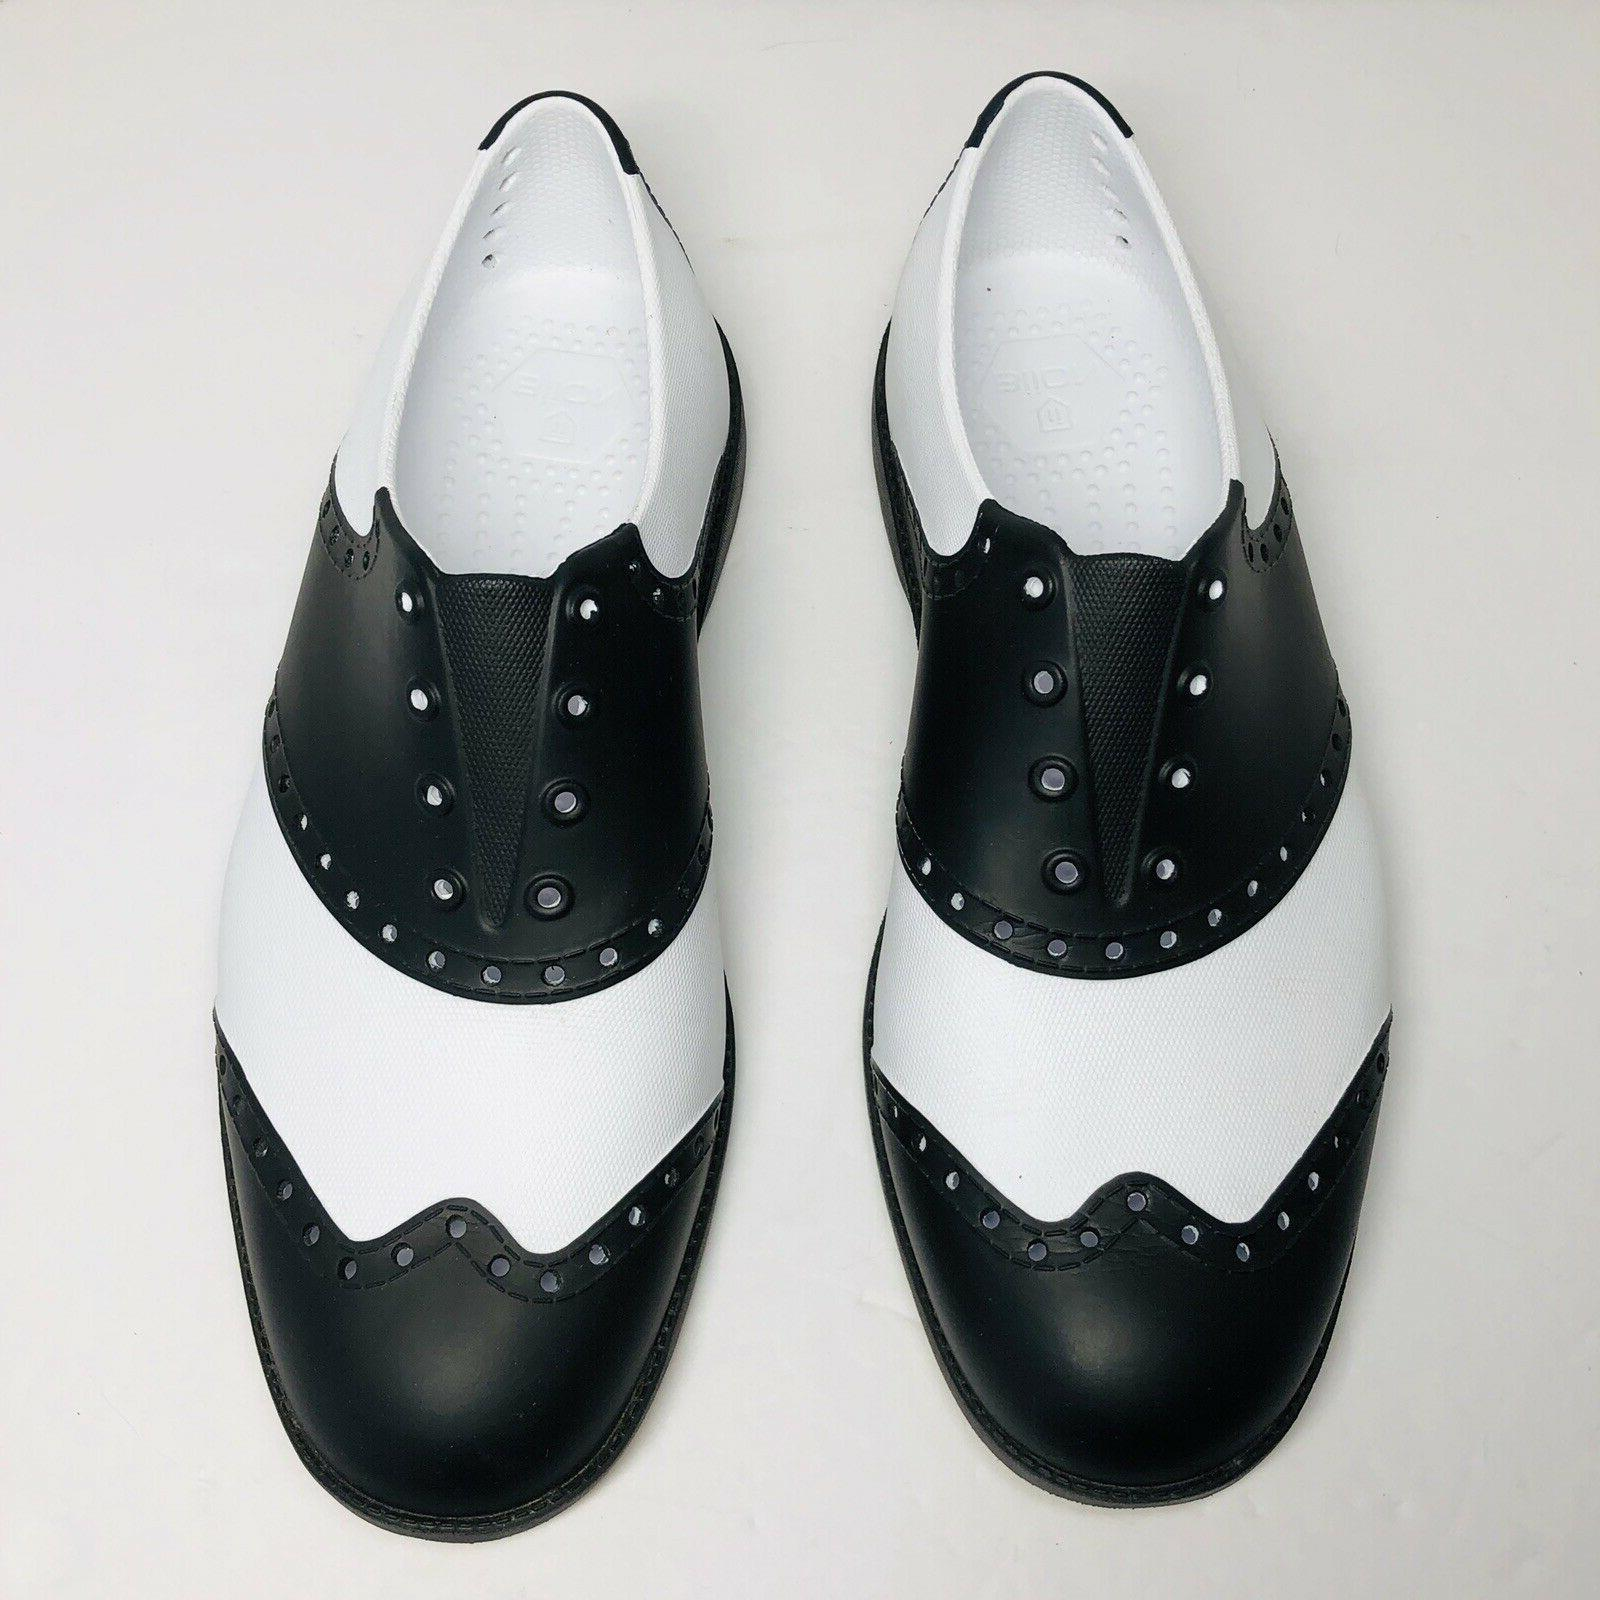 Biion Golf Shoes Classics BCL-1004 Men 9